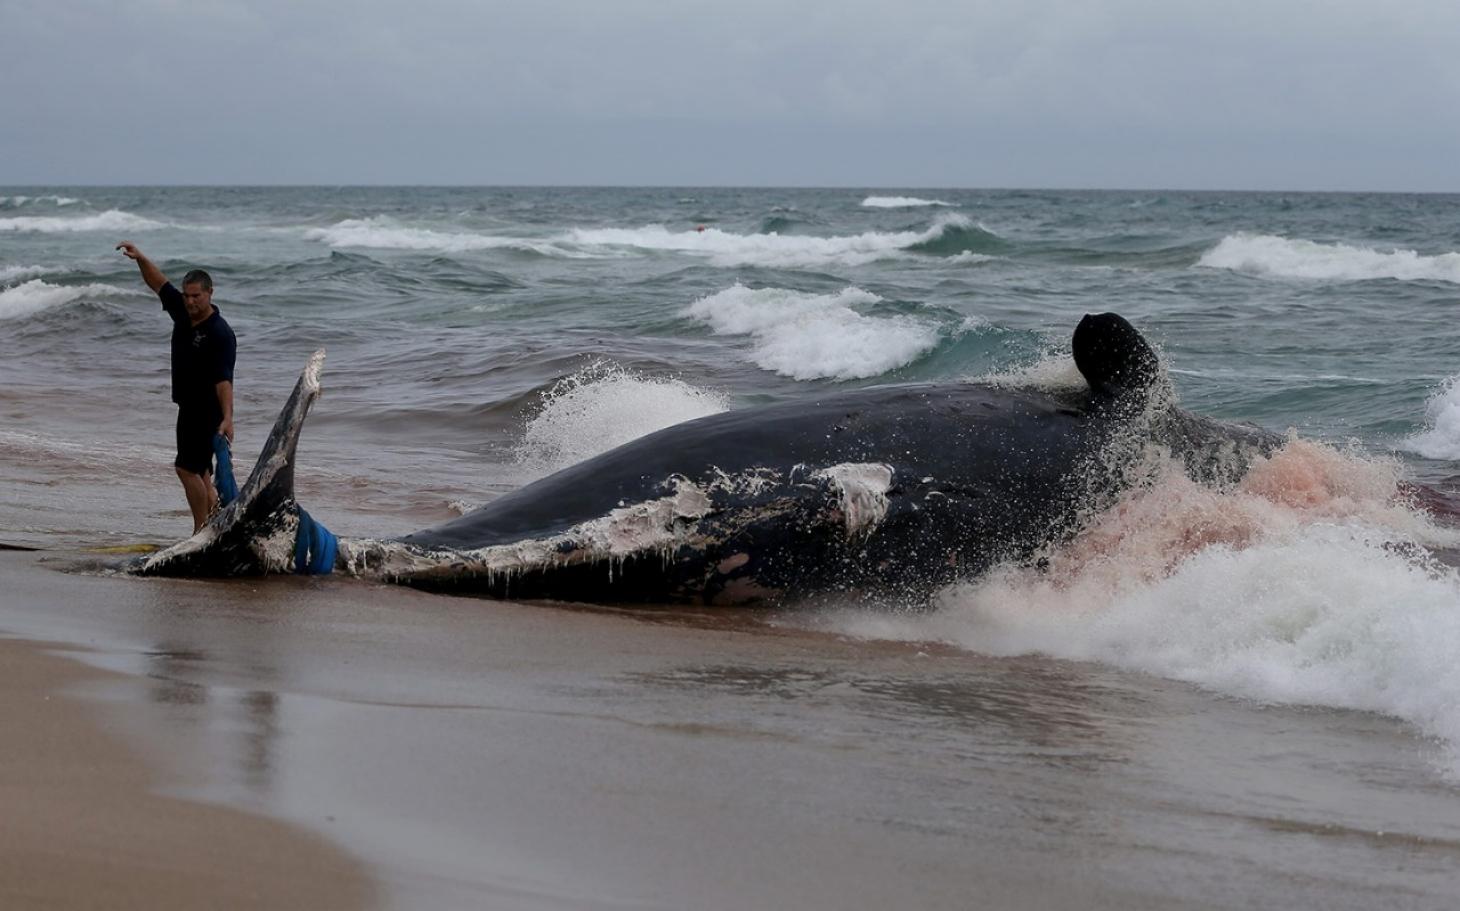 Study Ocean Life Faces Mass Extinction